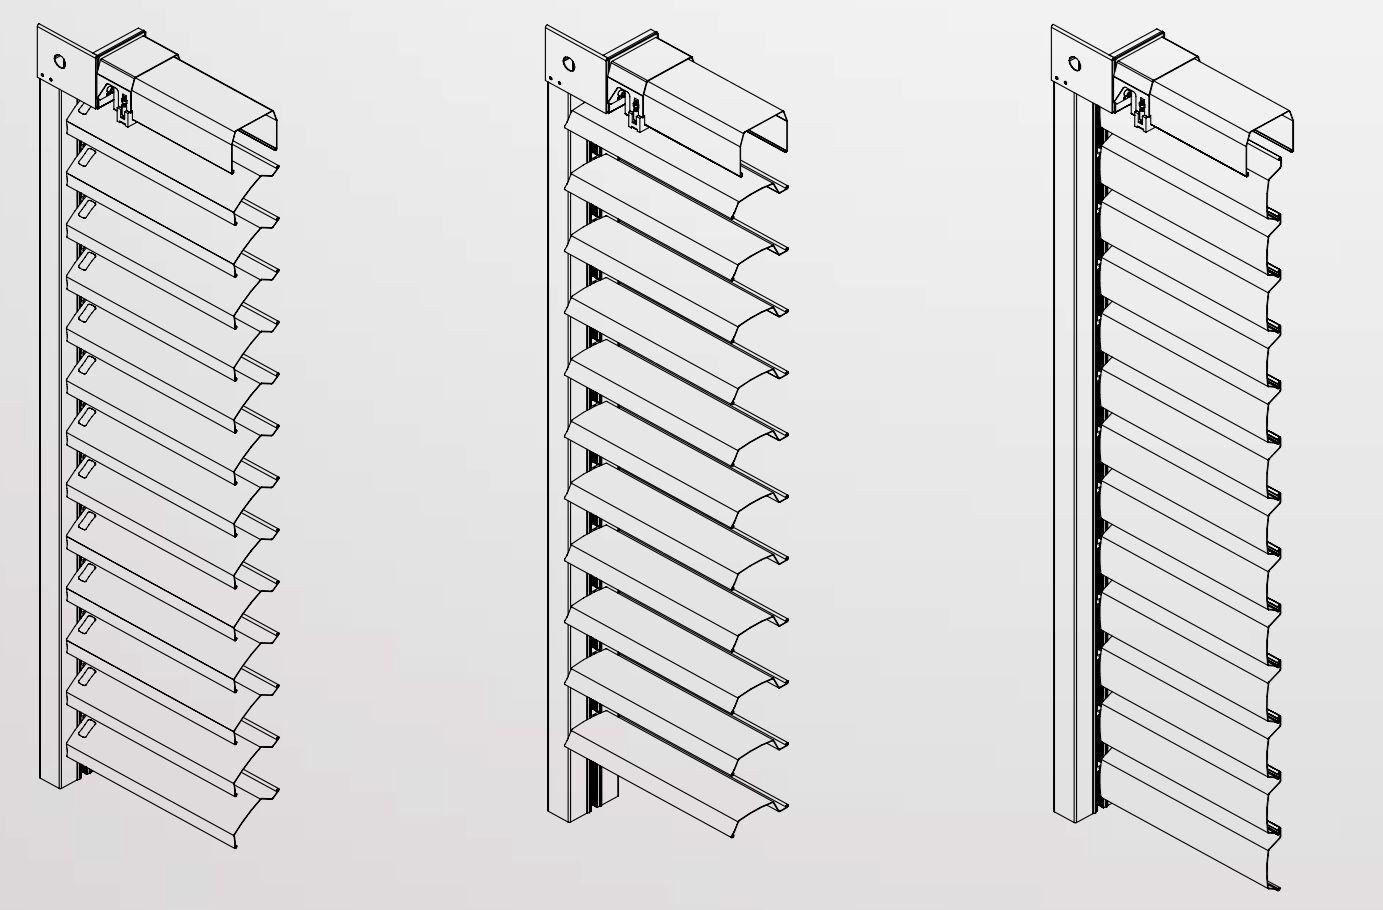 brise soleil orientable en aluminium incosun by in co var. Black Bedroom Furniture Sets. Home Design Ideas